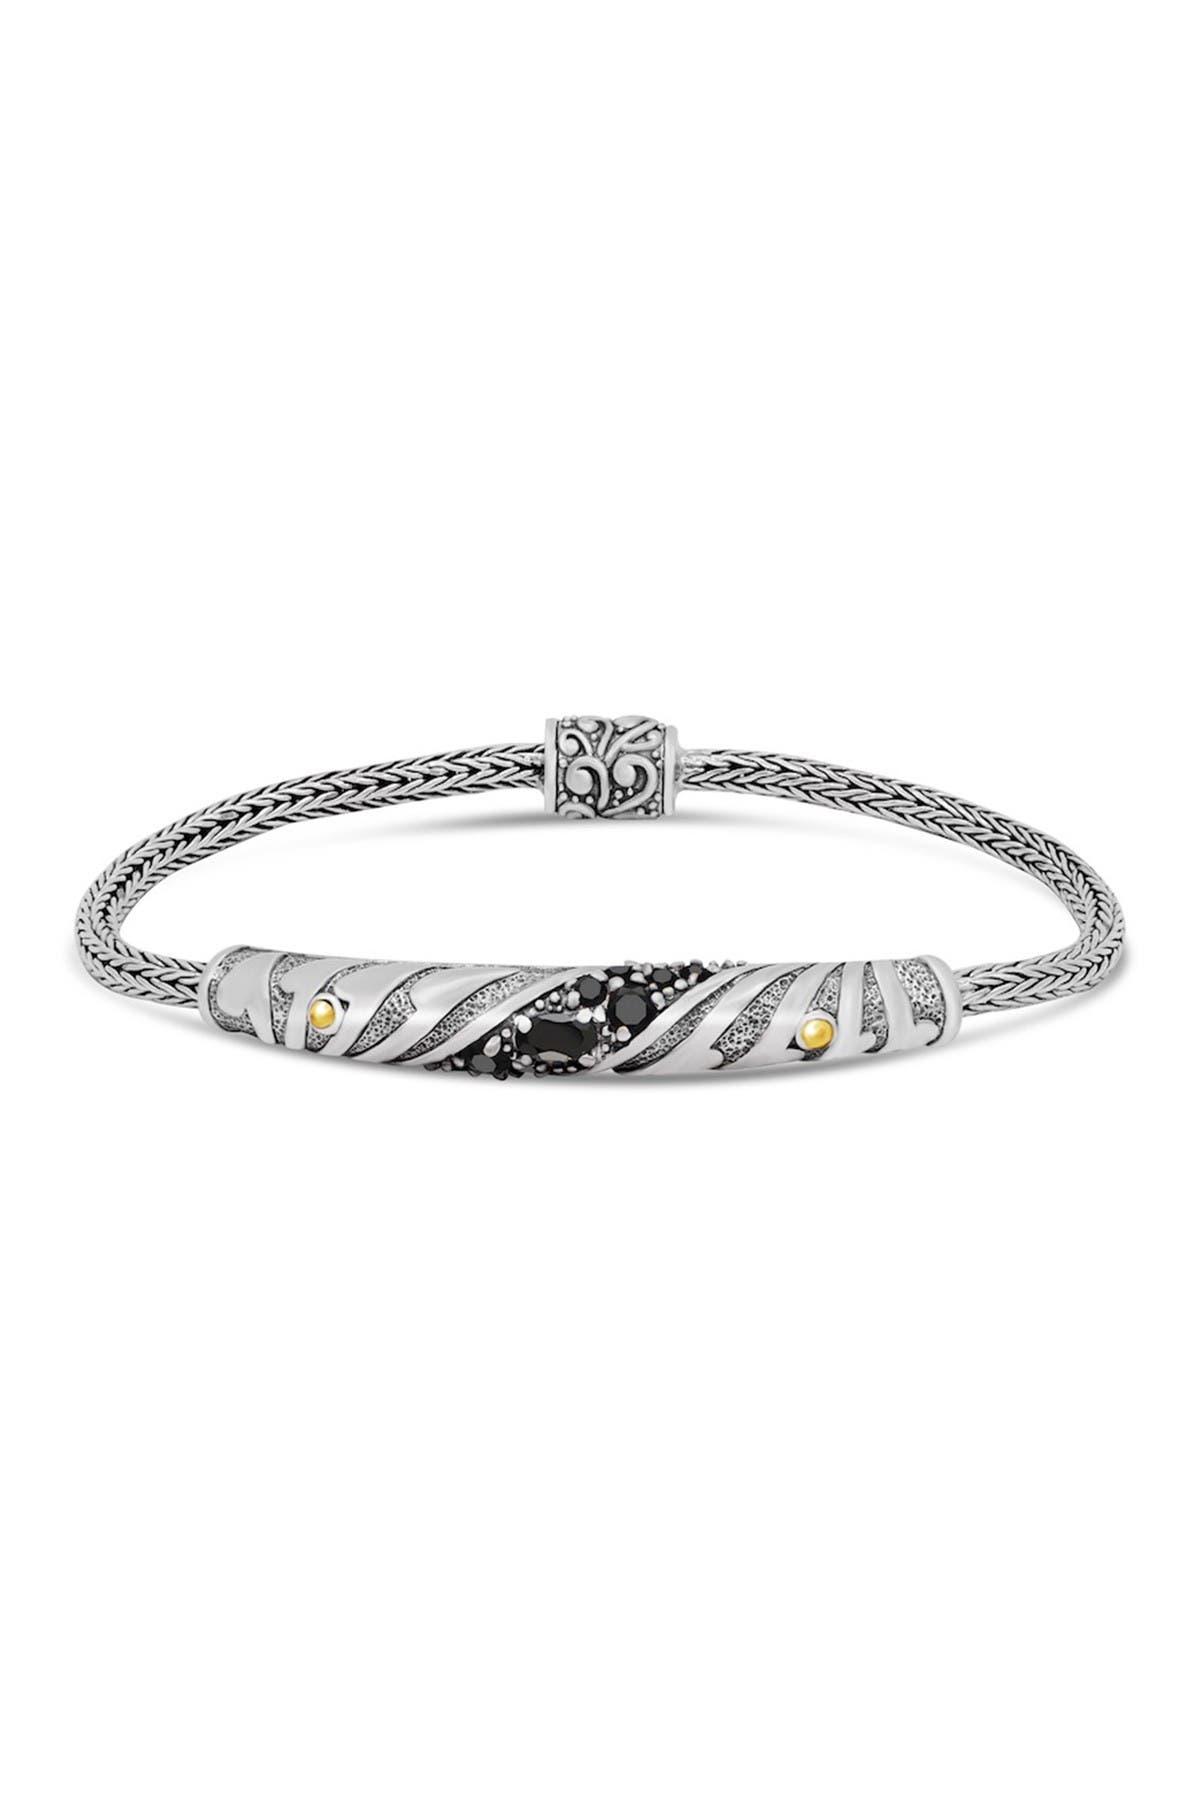 Image of DEVATA Sterling Silver 18K Yellow Gold Accented Bali Filigree Black Spinel Charm Bracelet